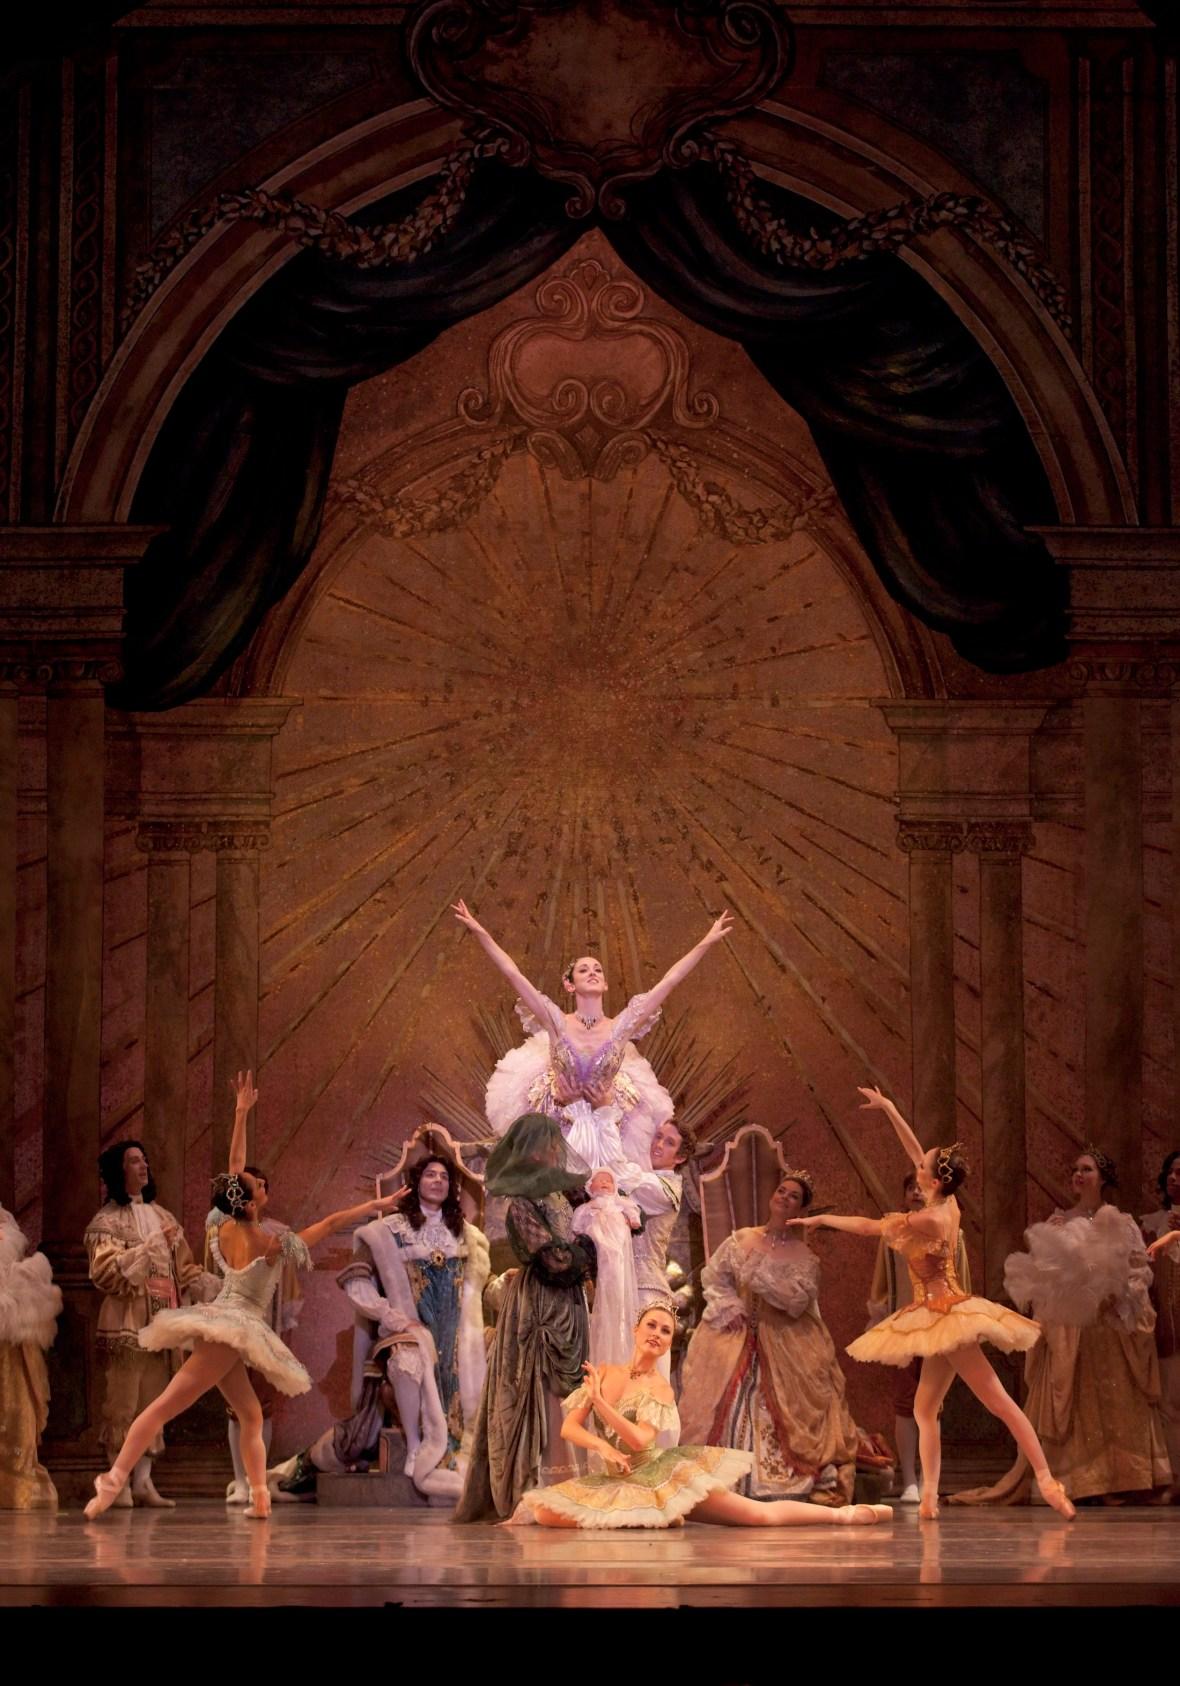 Sleeping_Beauty_2010_BlaineCT_02 | Oregon Ballet Theatre